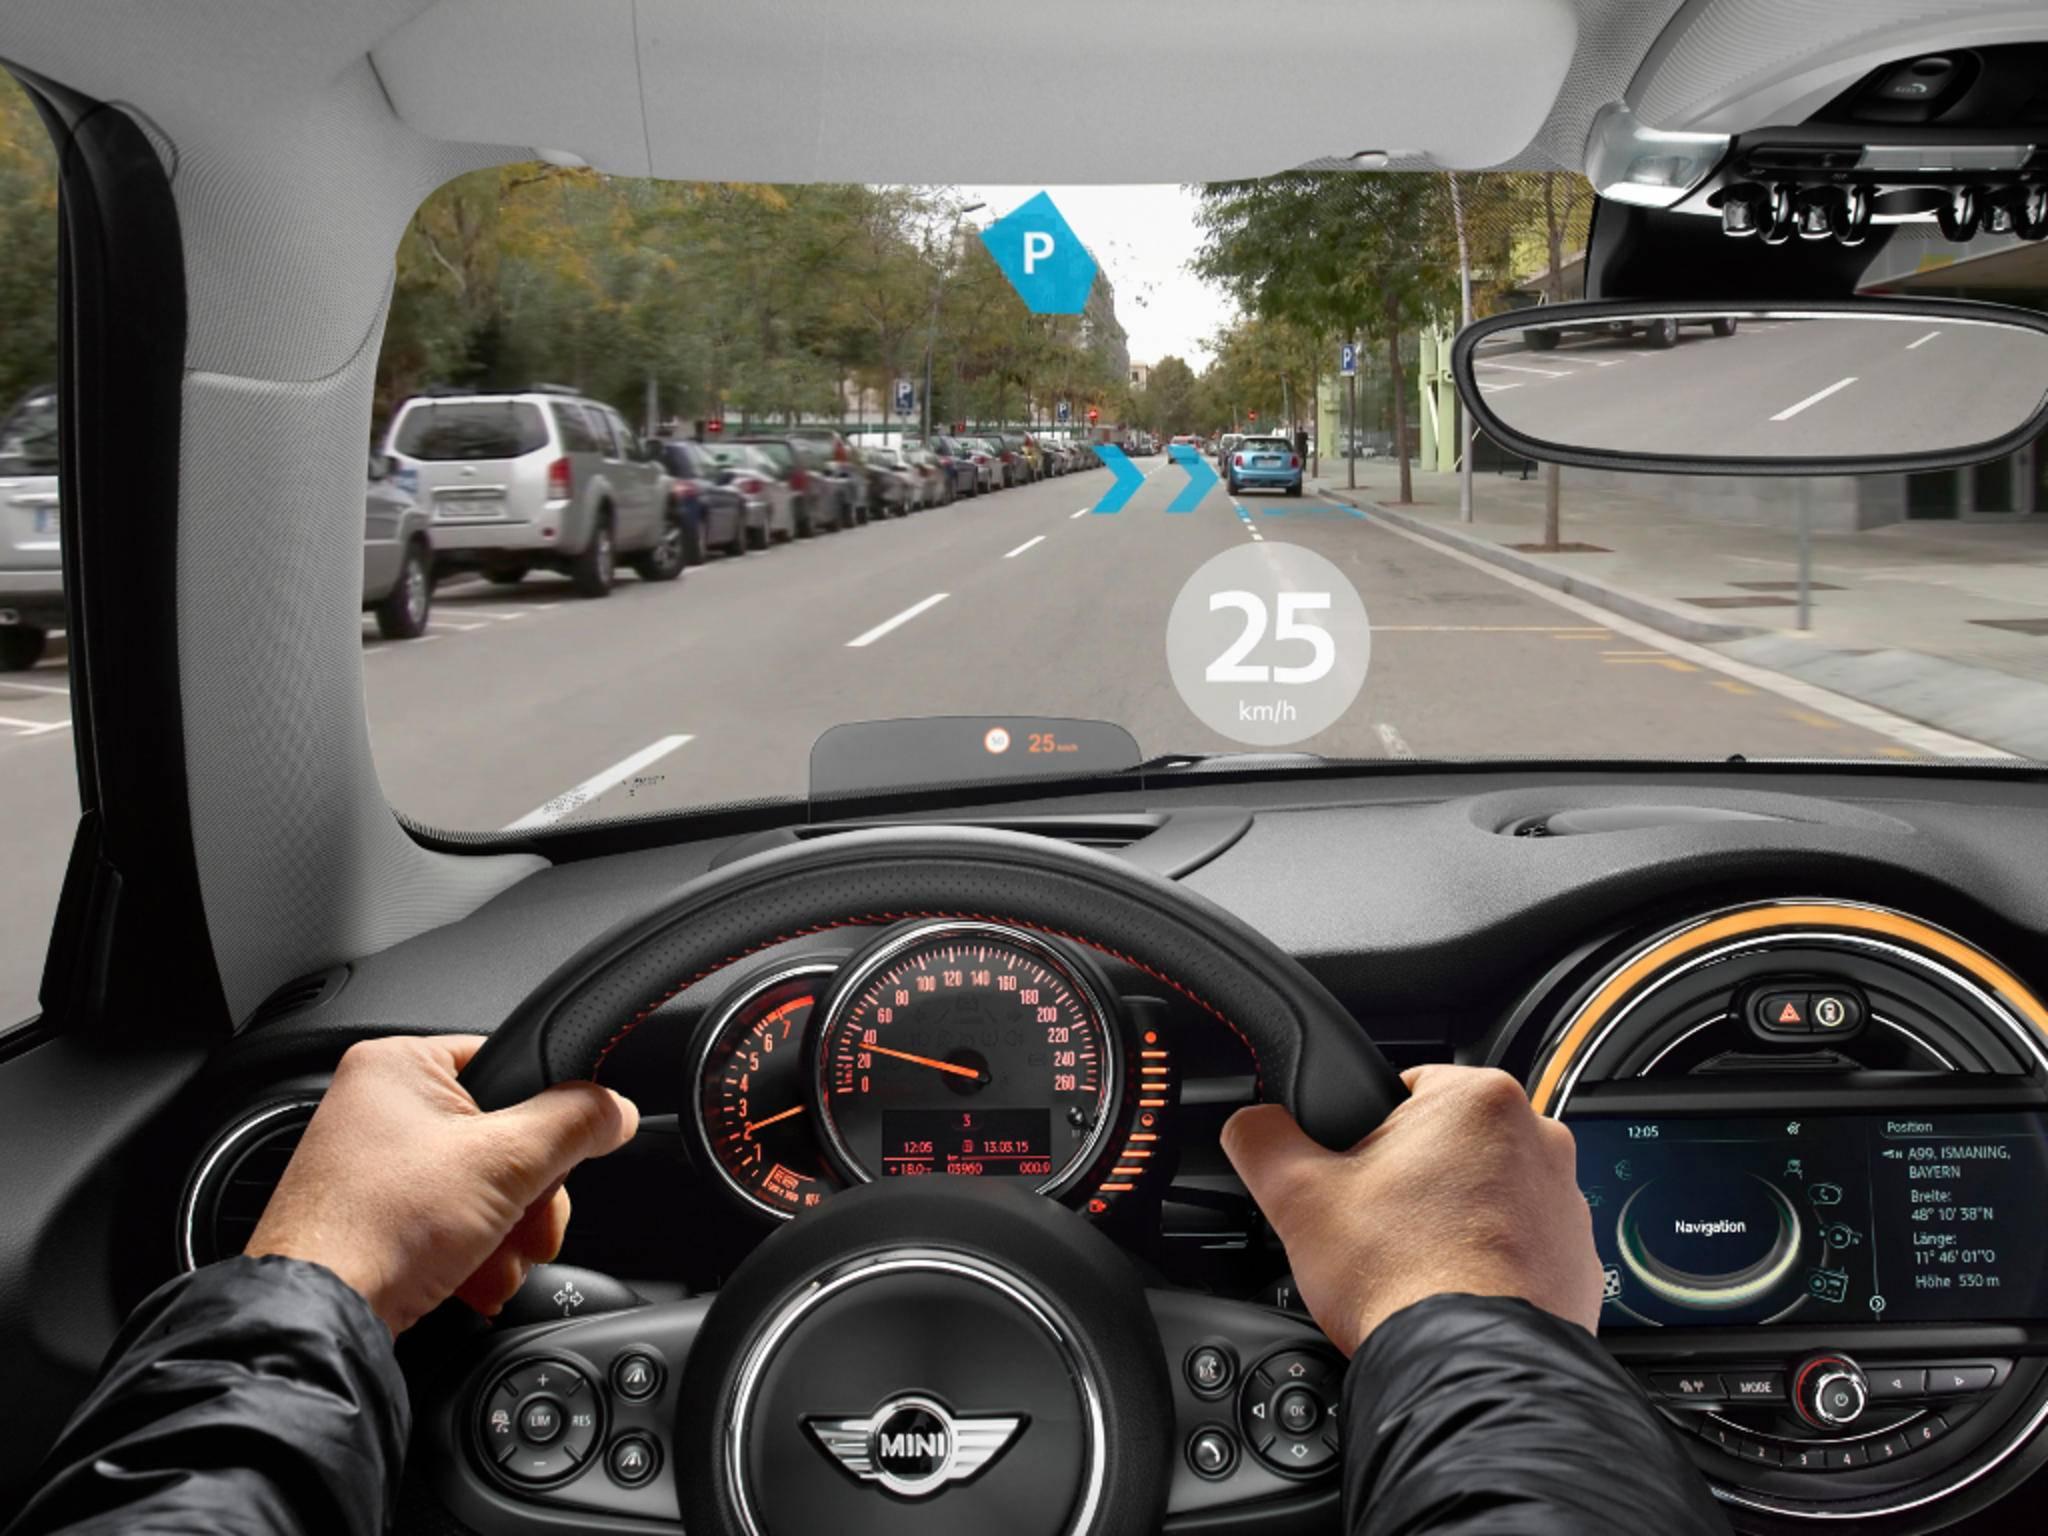 Dank Datenbrille sollen Mini-Fahrer bald mehr sehen als Andere.